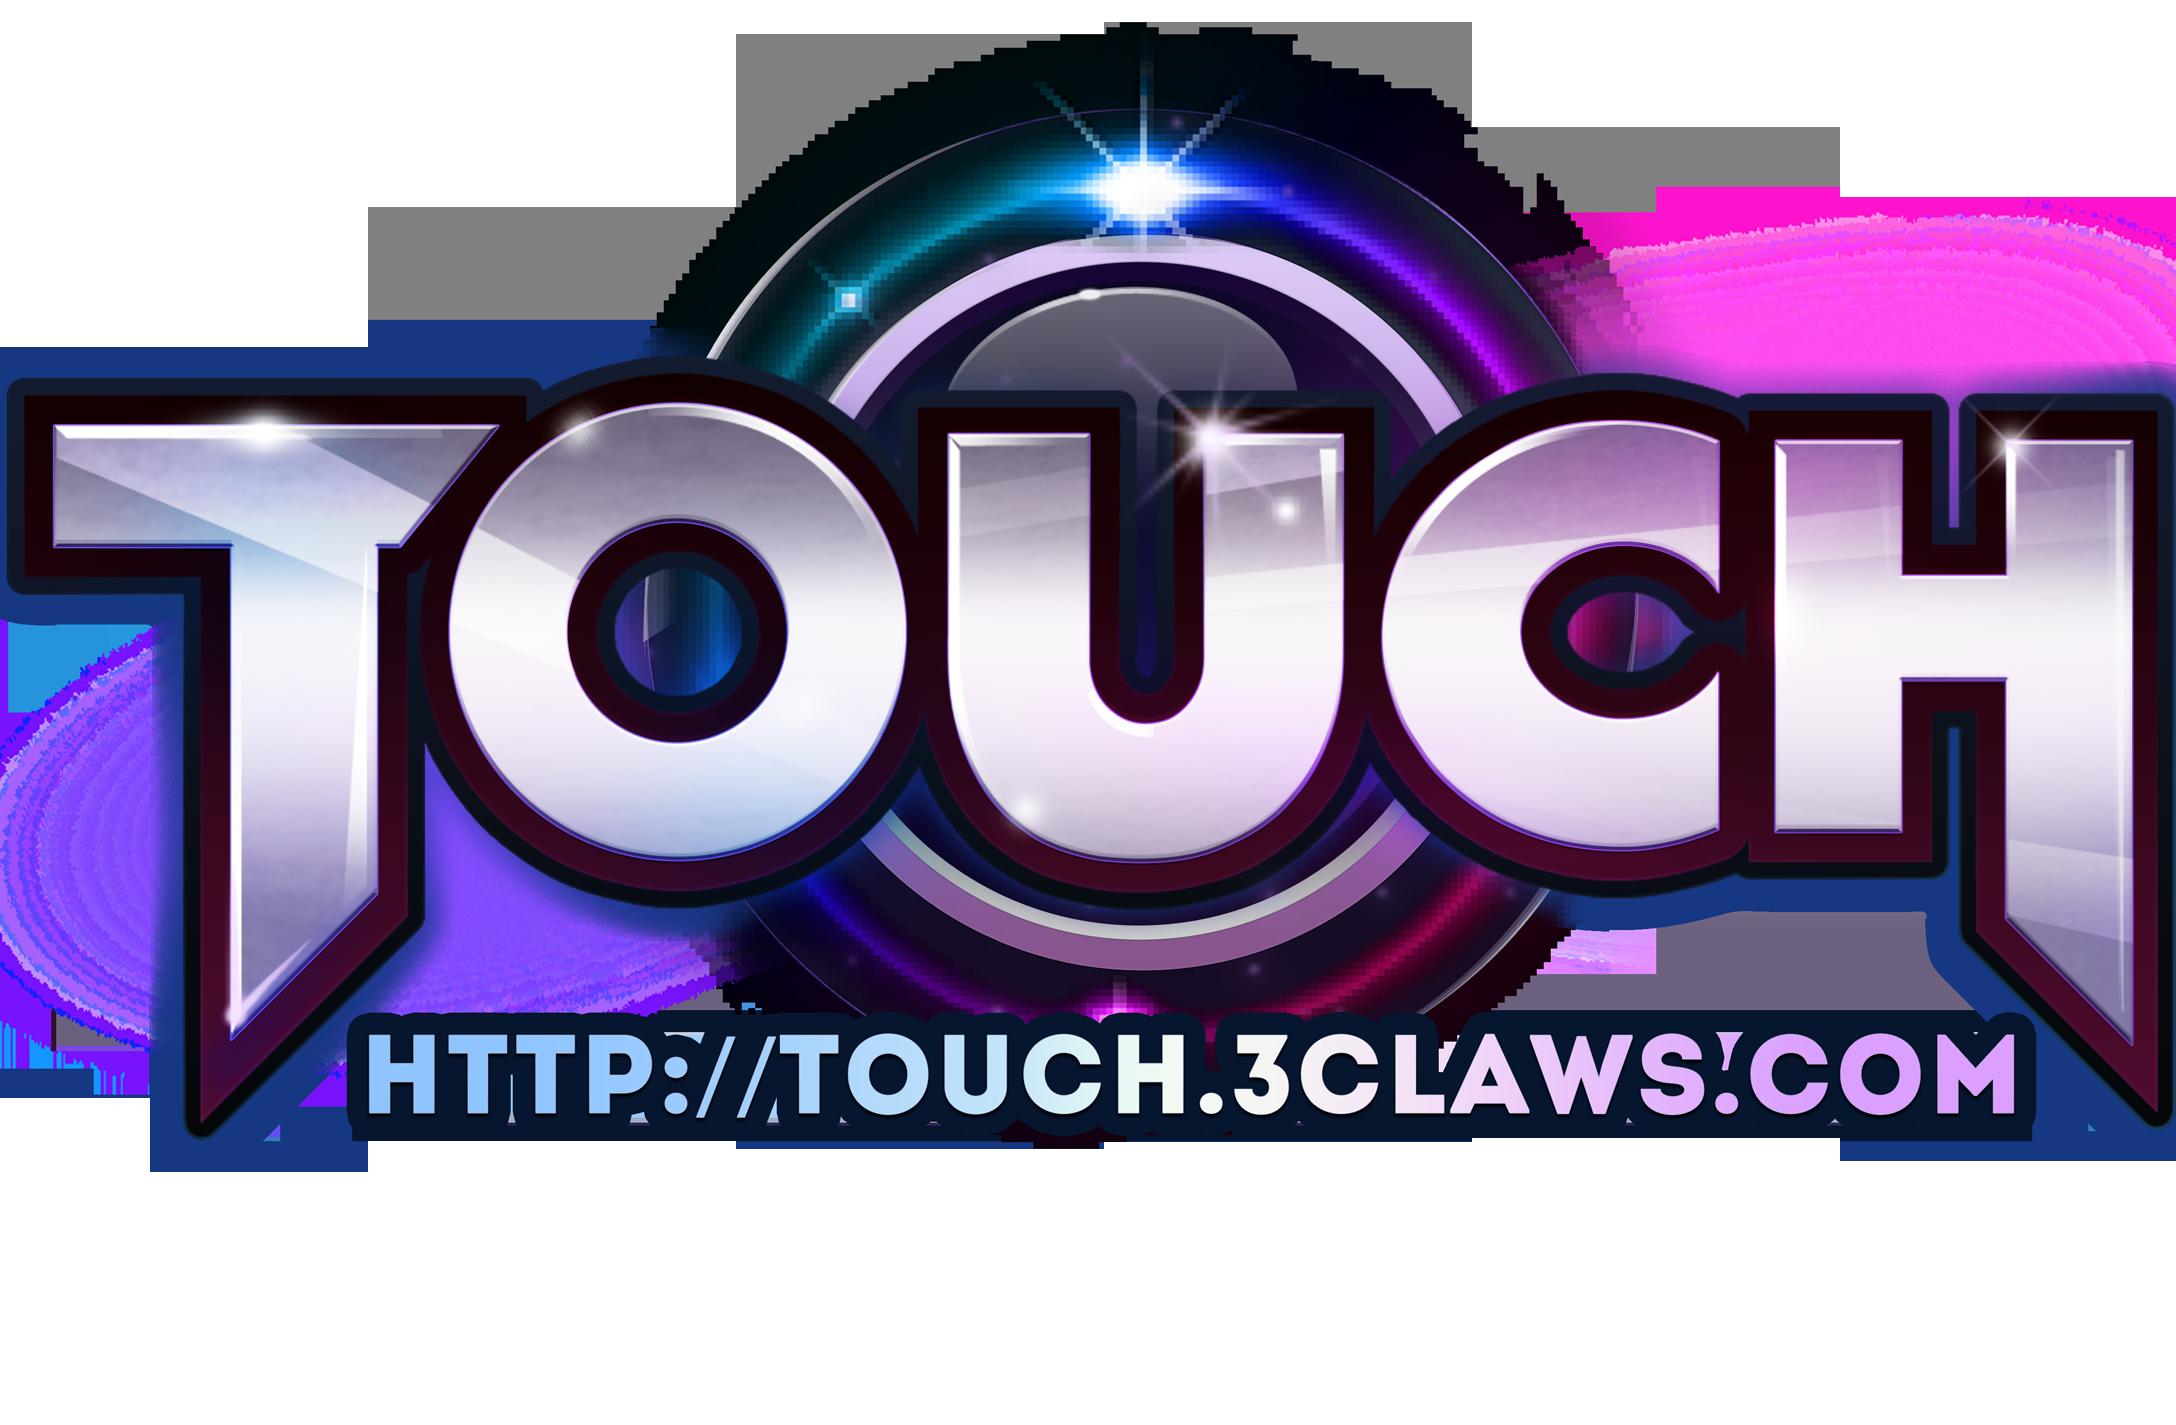 Touch 3claws Online Logos Game Logo Design Logos Game Logo